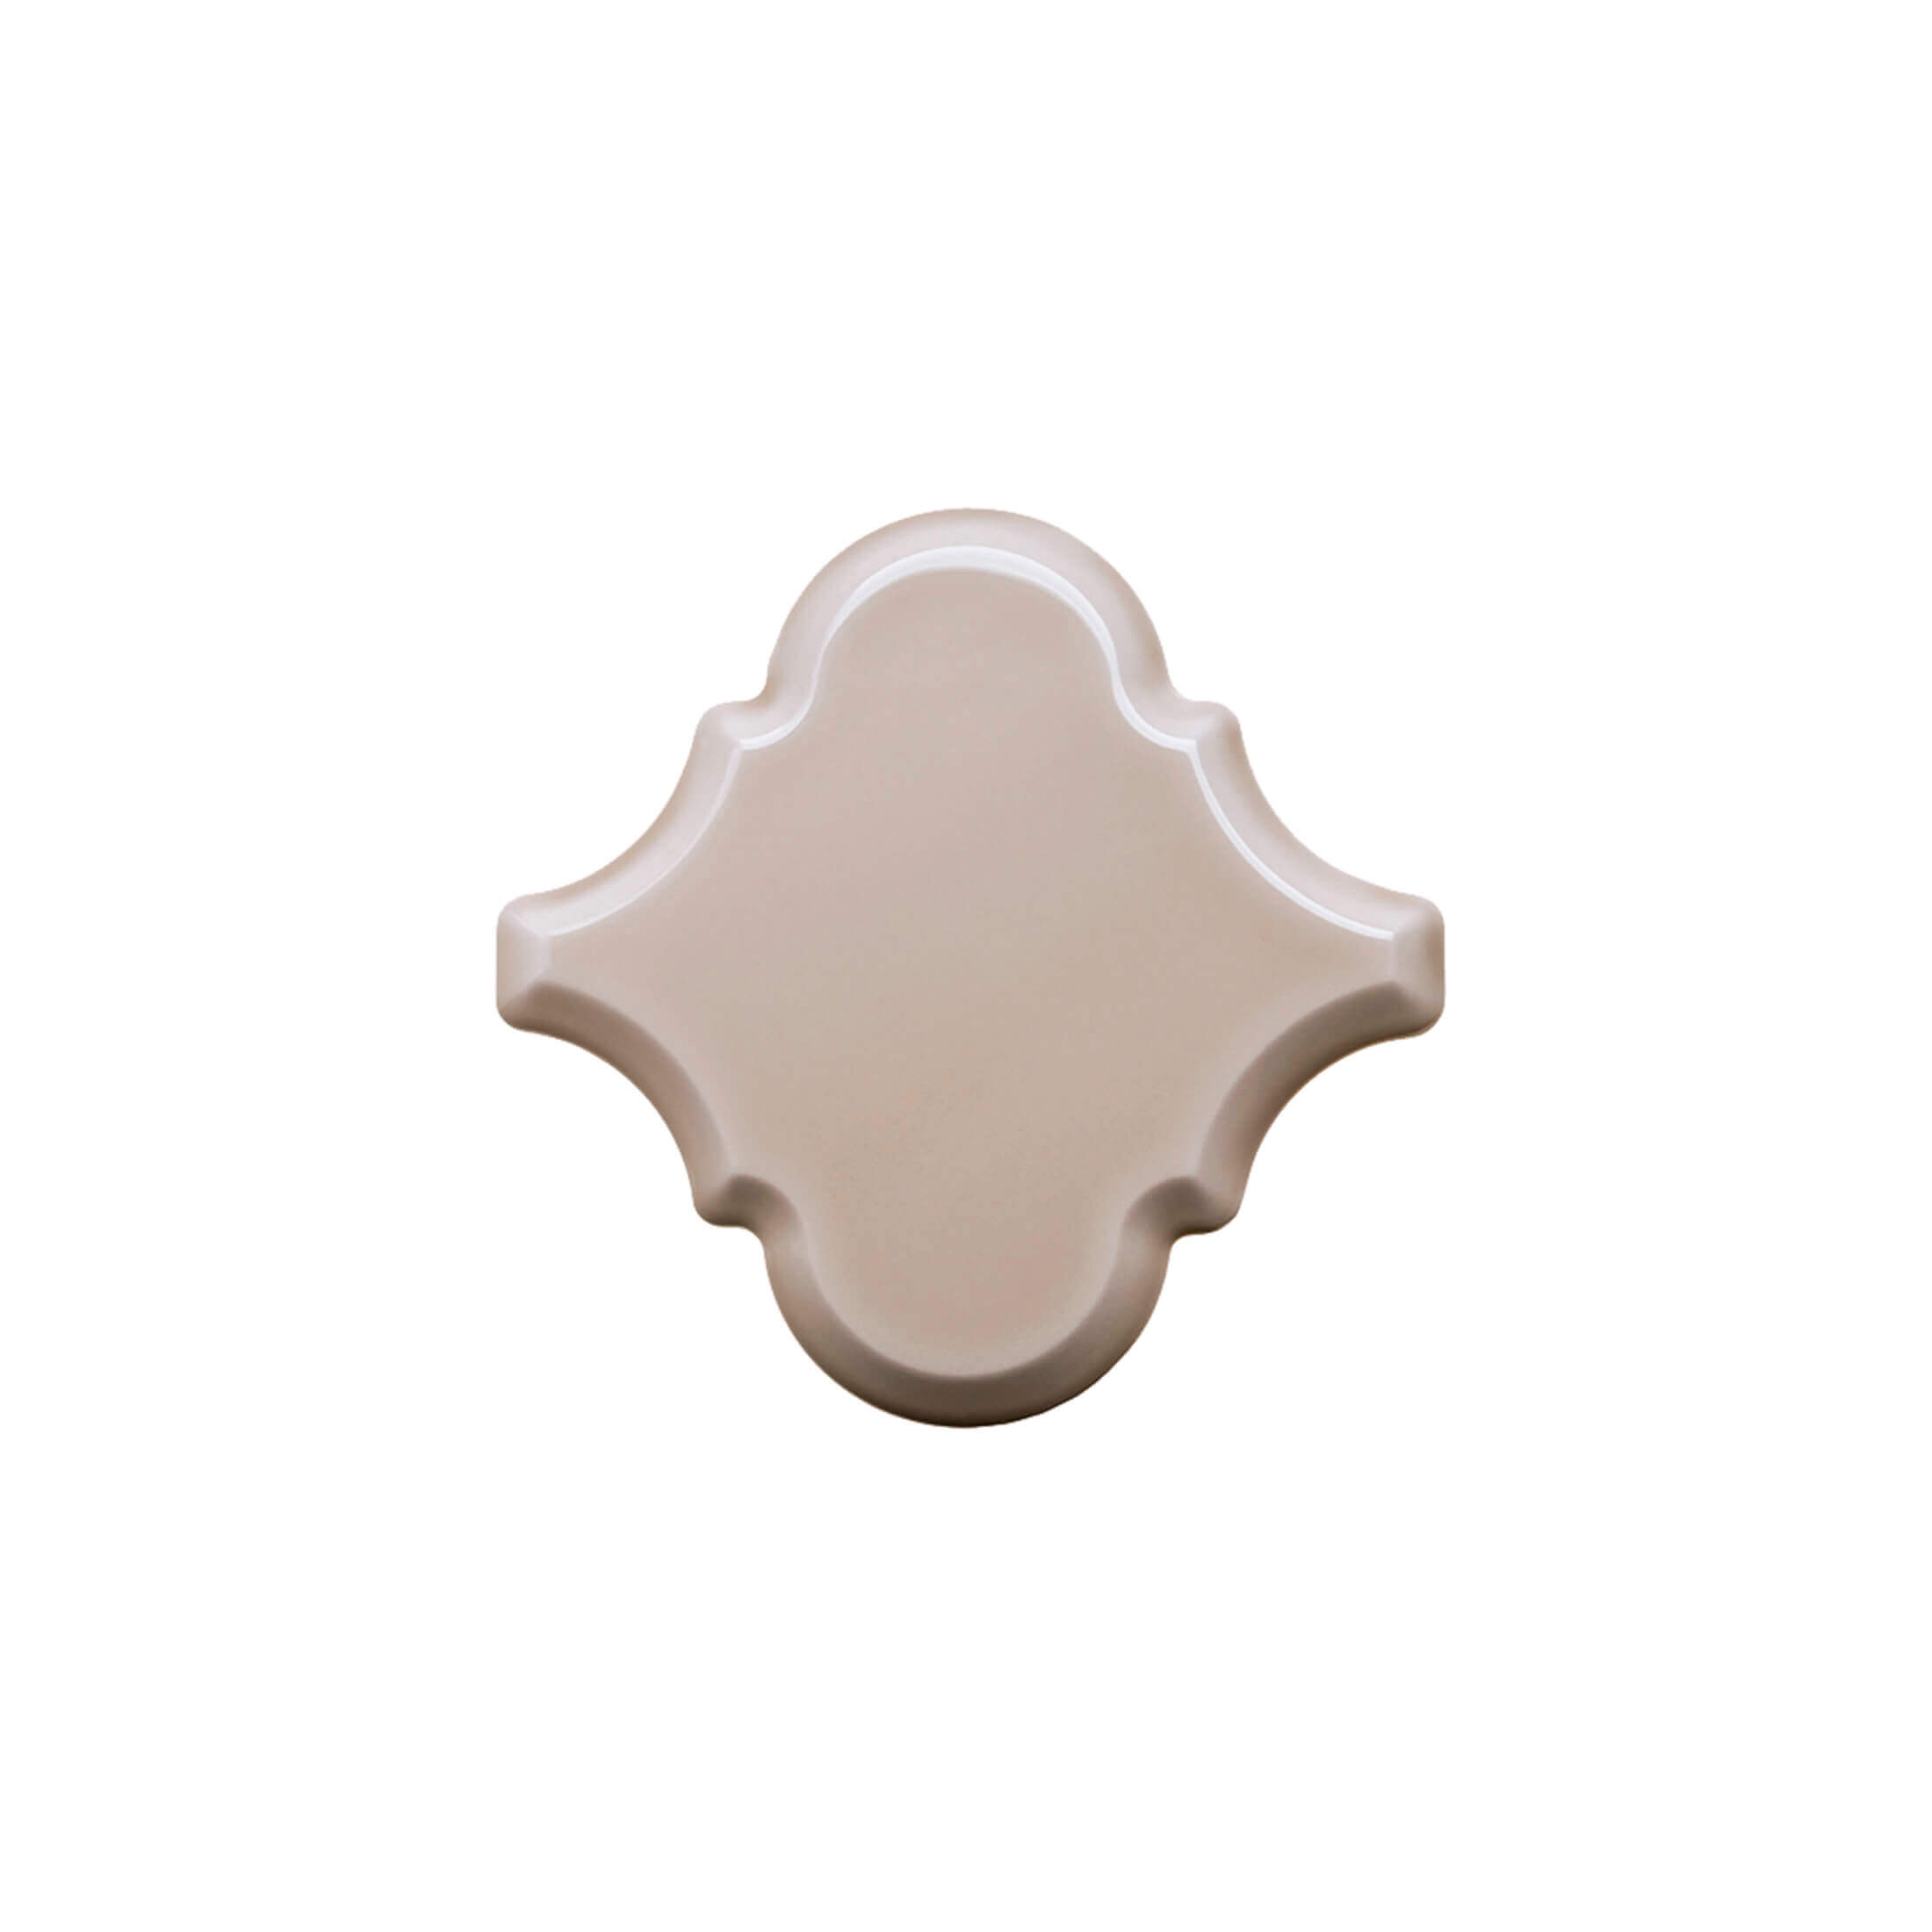 ADST8003 - ARABESCO SILVER SANDS - 15 cm X 15 cm